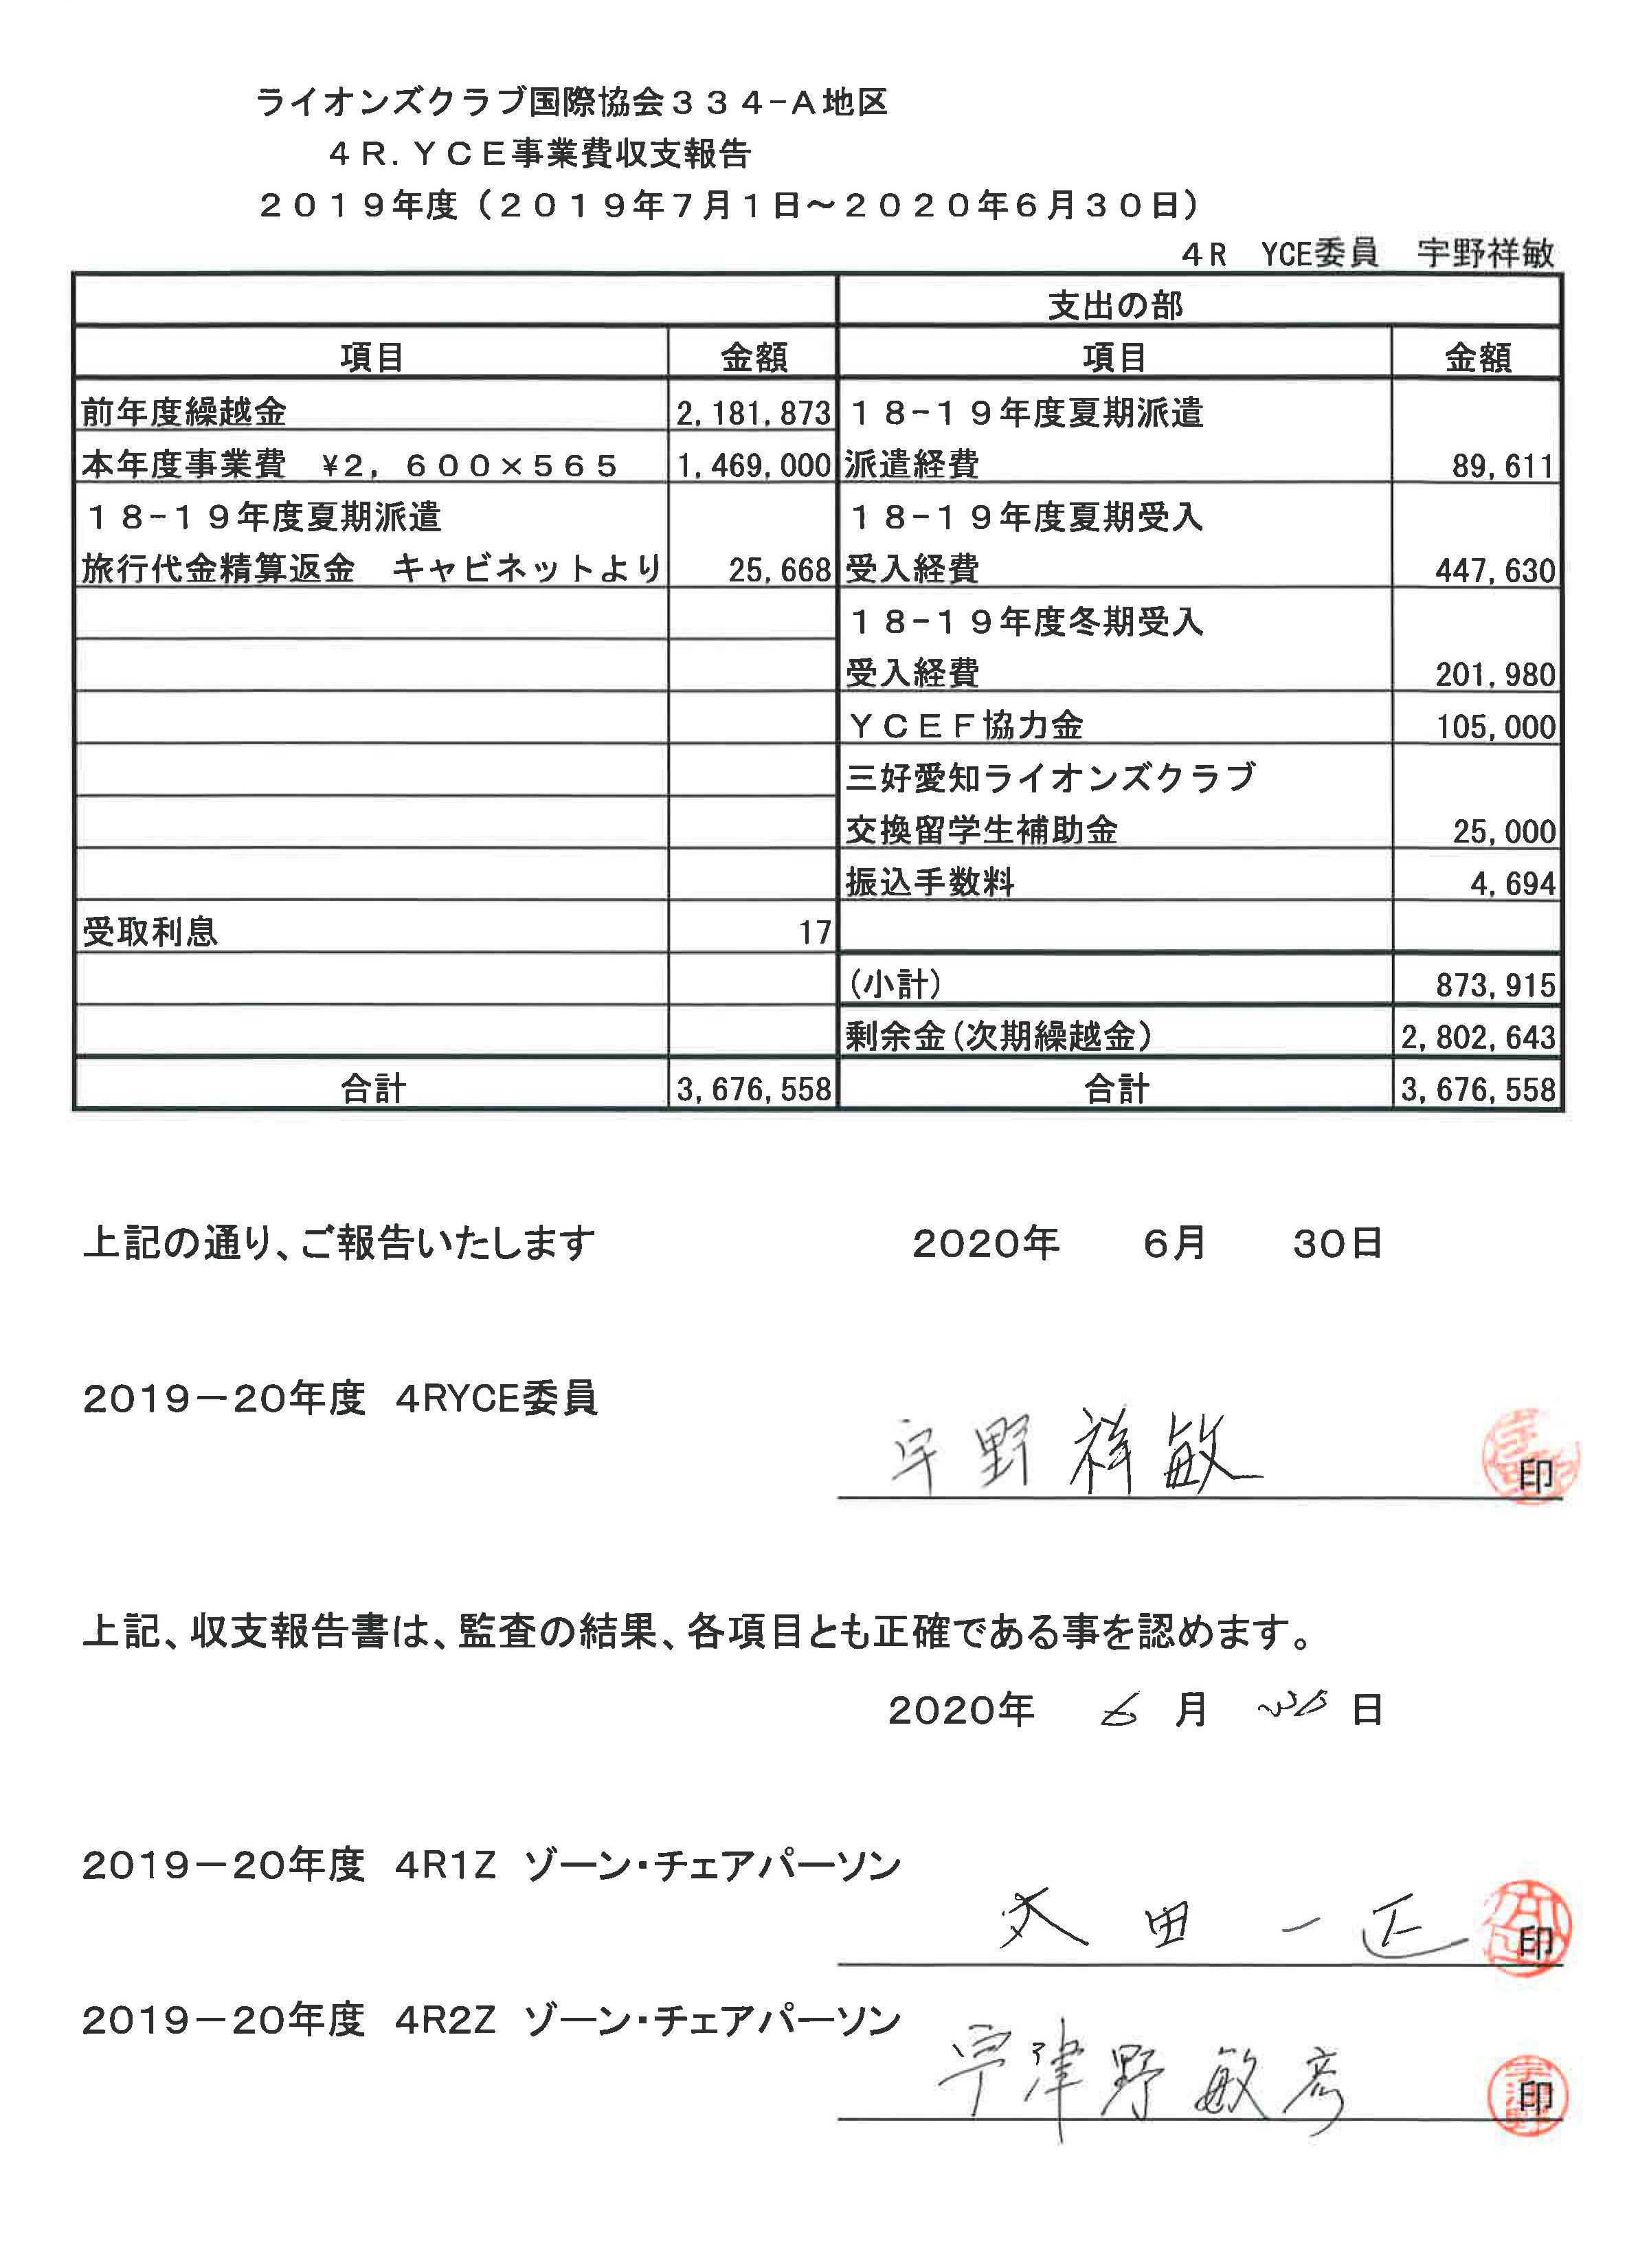 23 4R.YCE事業費収支報告